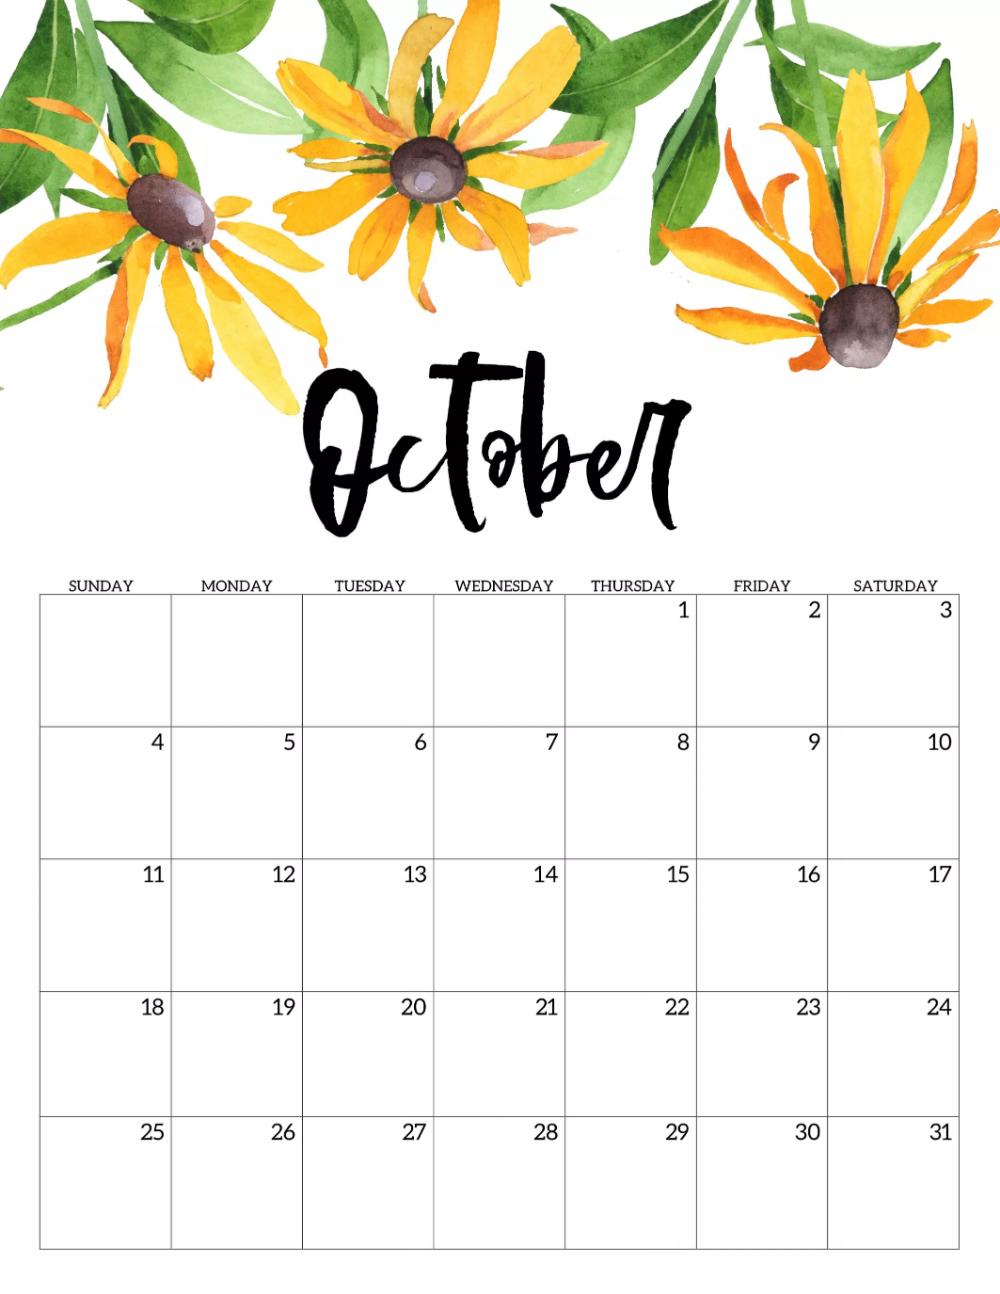 Pin By Nur Insyirah Hanani On Calender 2020 Print Calendar Free Printable Calendar Flower Calendar